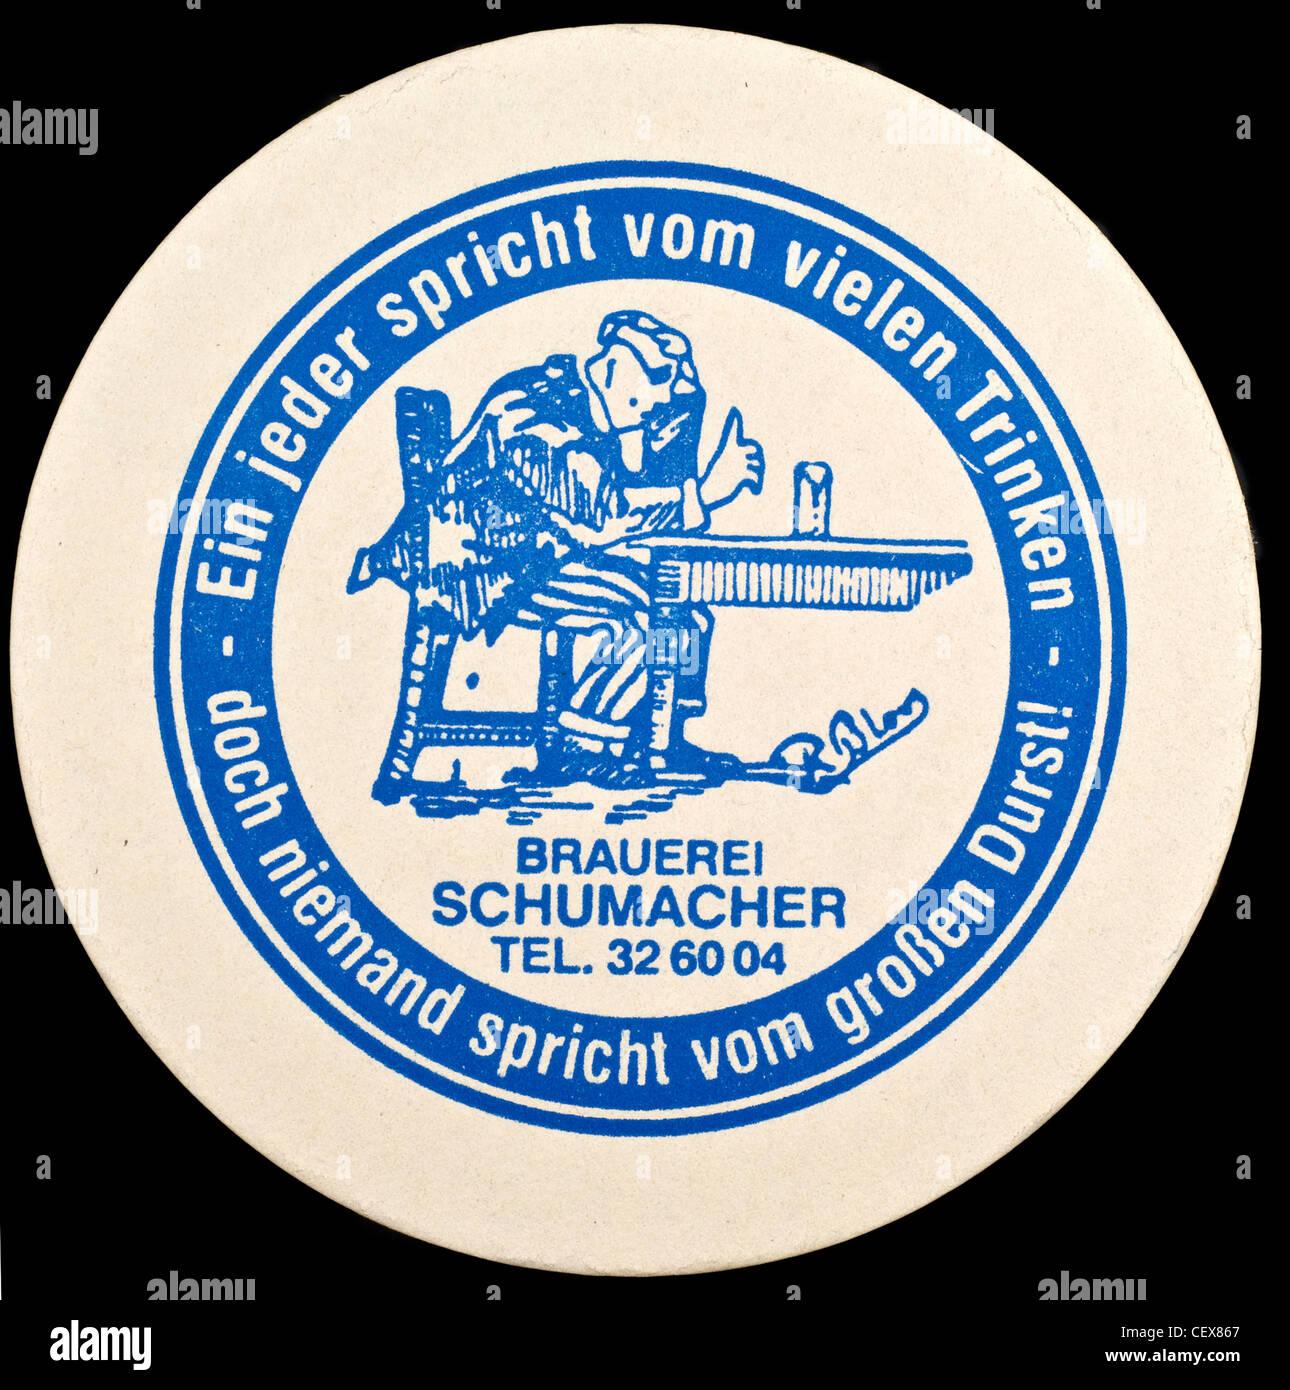 Schumacher Alt Beer mat,  Düsseldorf, Germany. Stock Photo